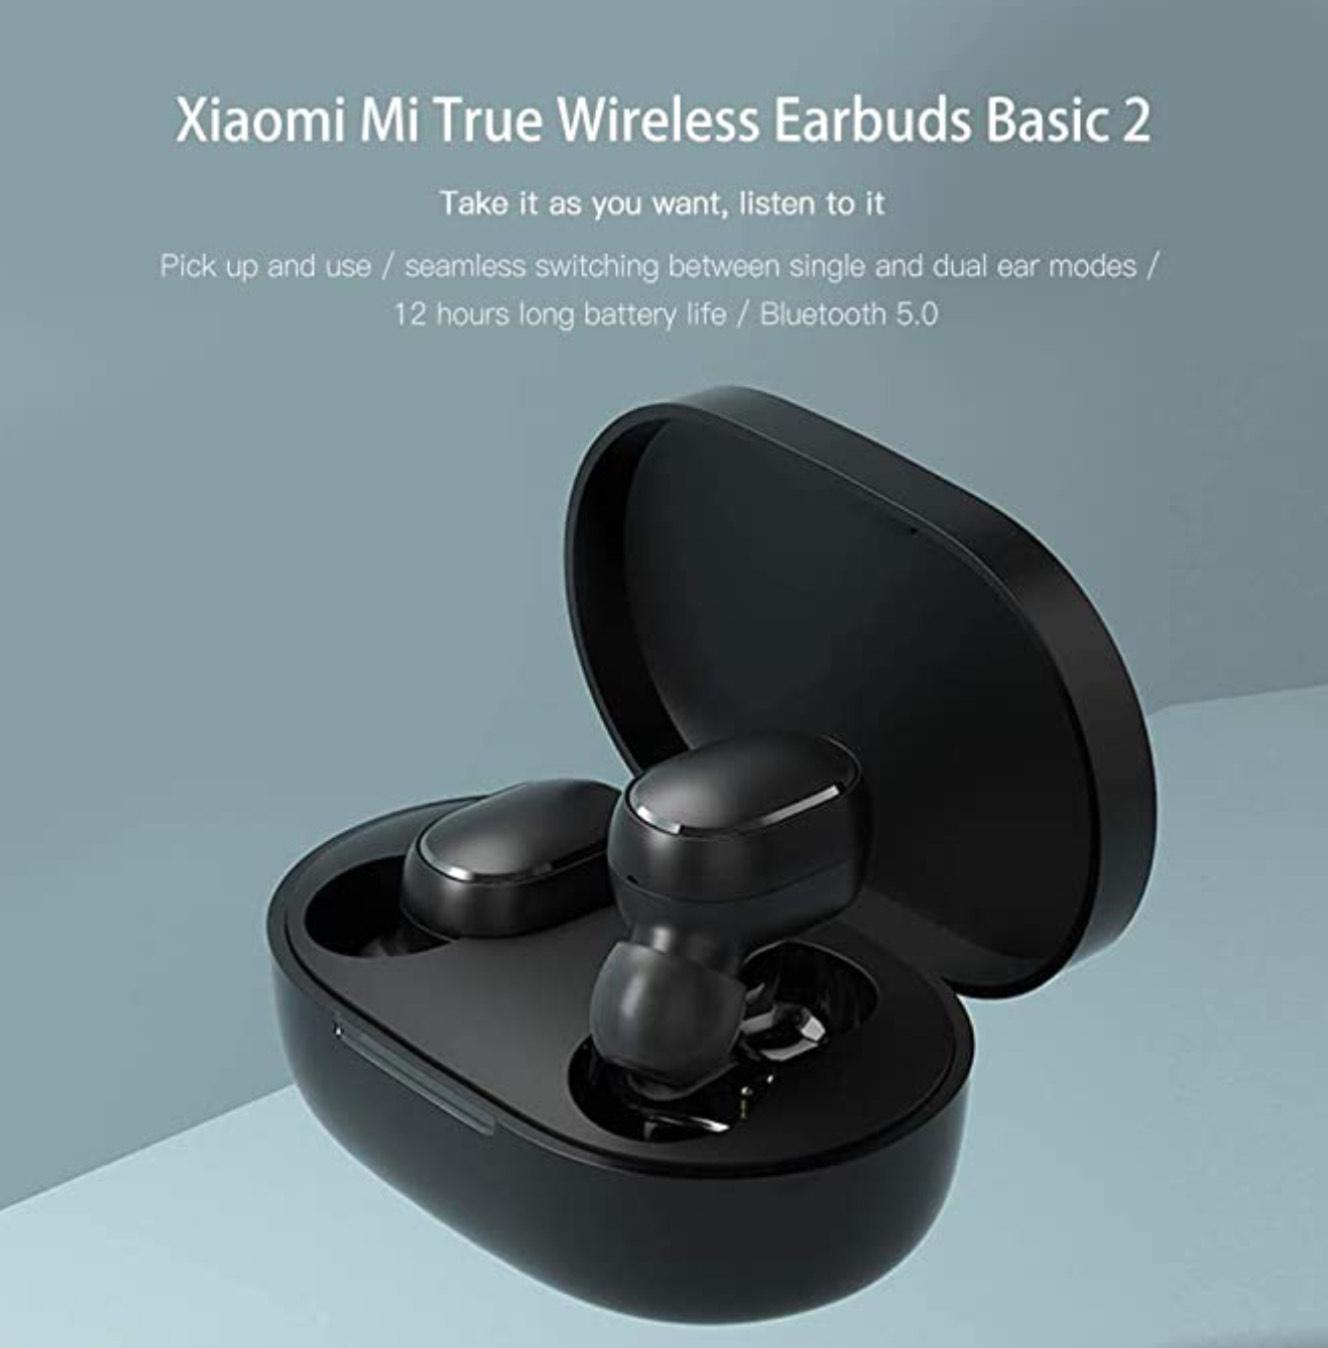 Xiaomi Mi True Wireless Earbuds Basic 2,Airdots 2